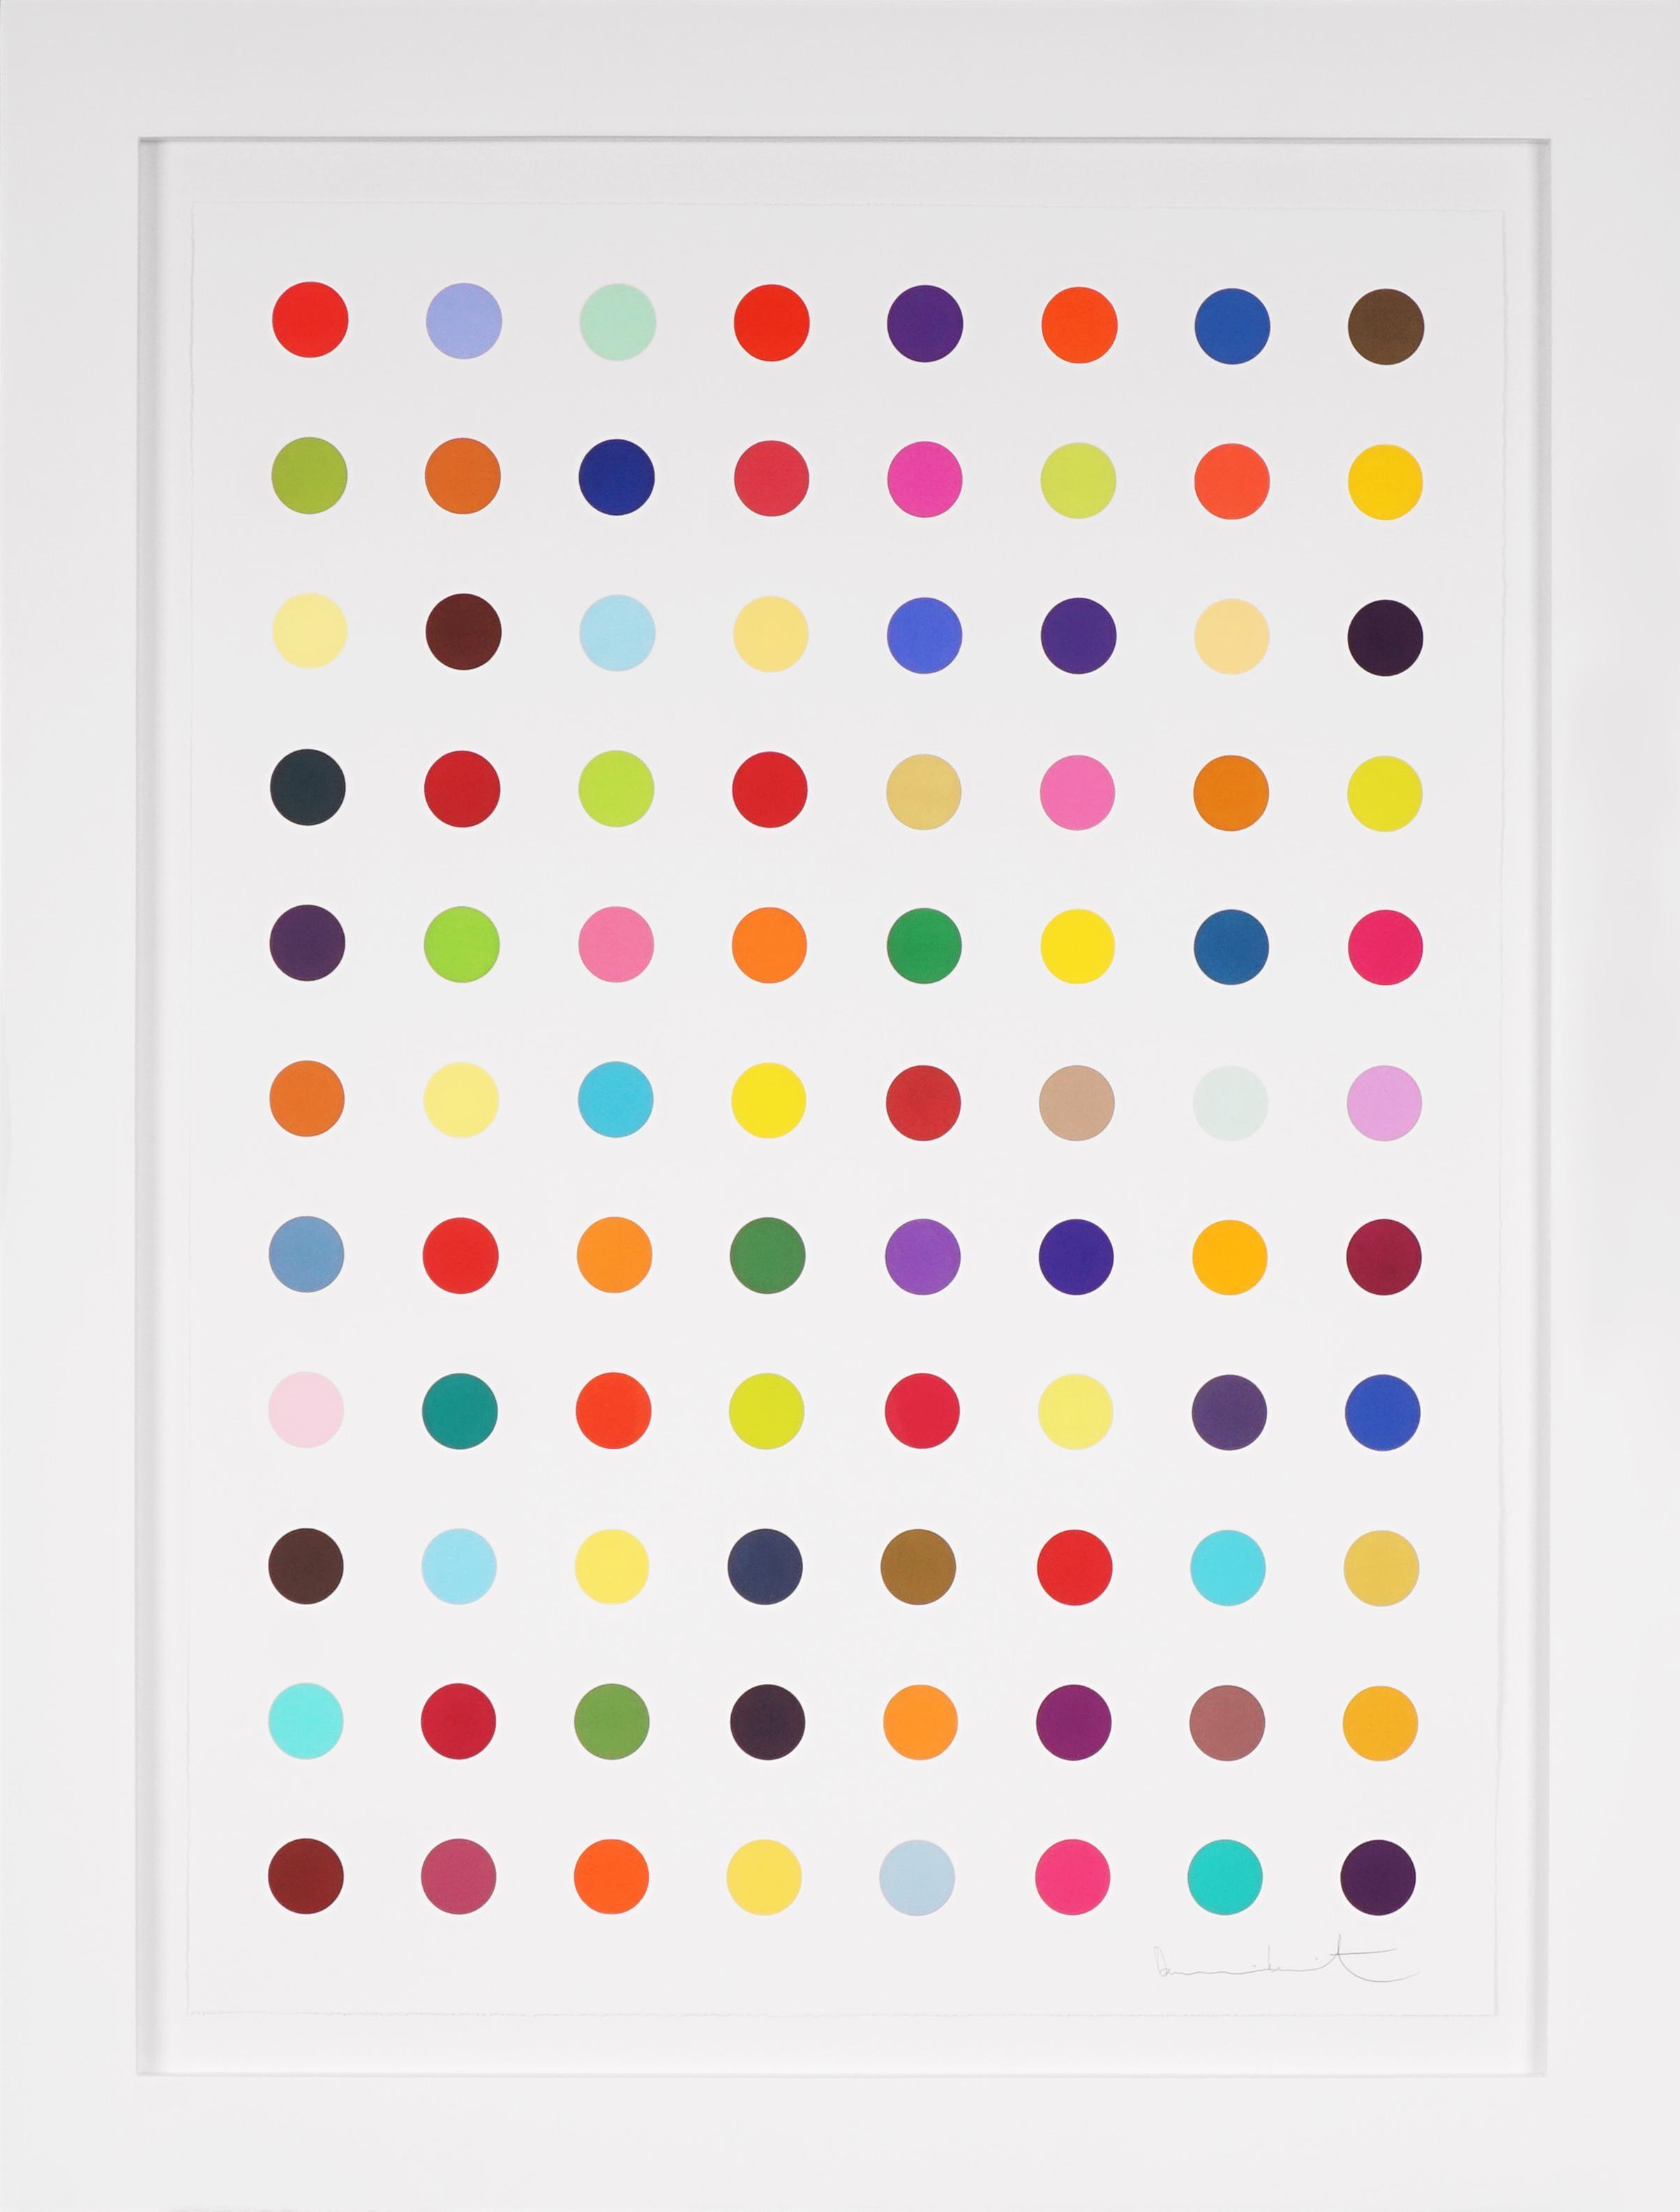 Damien Hirst, Vertical 'Spots' III, Woodcut, 2018